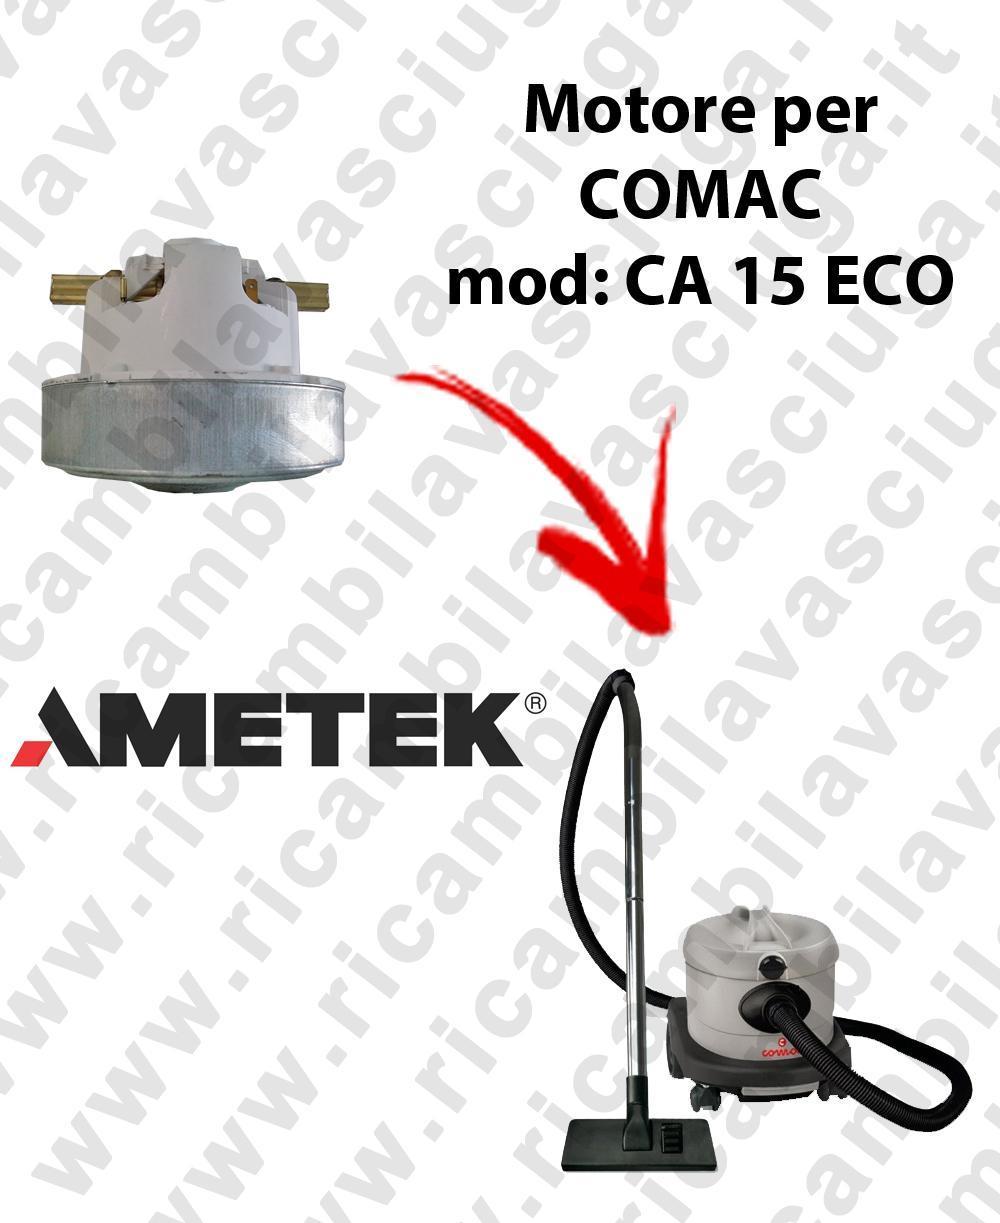 CA 15 ECO AMETEK Vacuum motor for vacuum cleaner COMAC